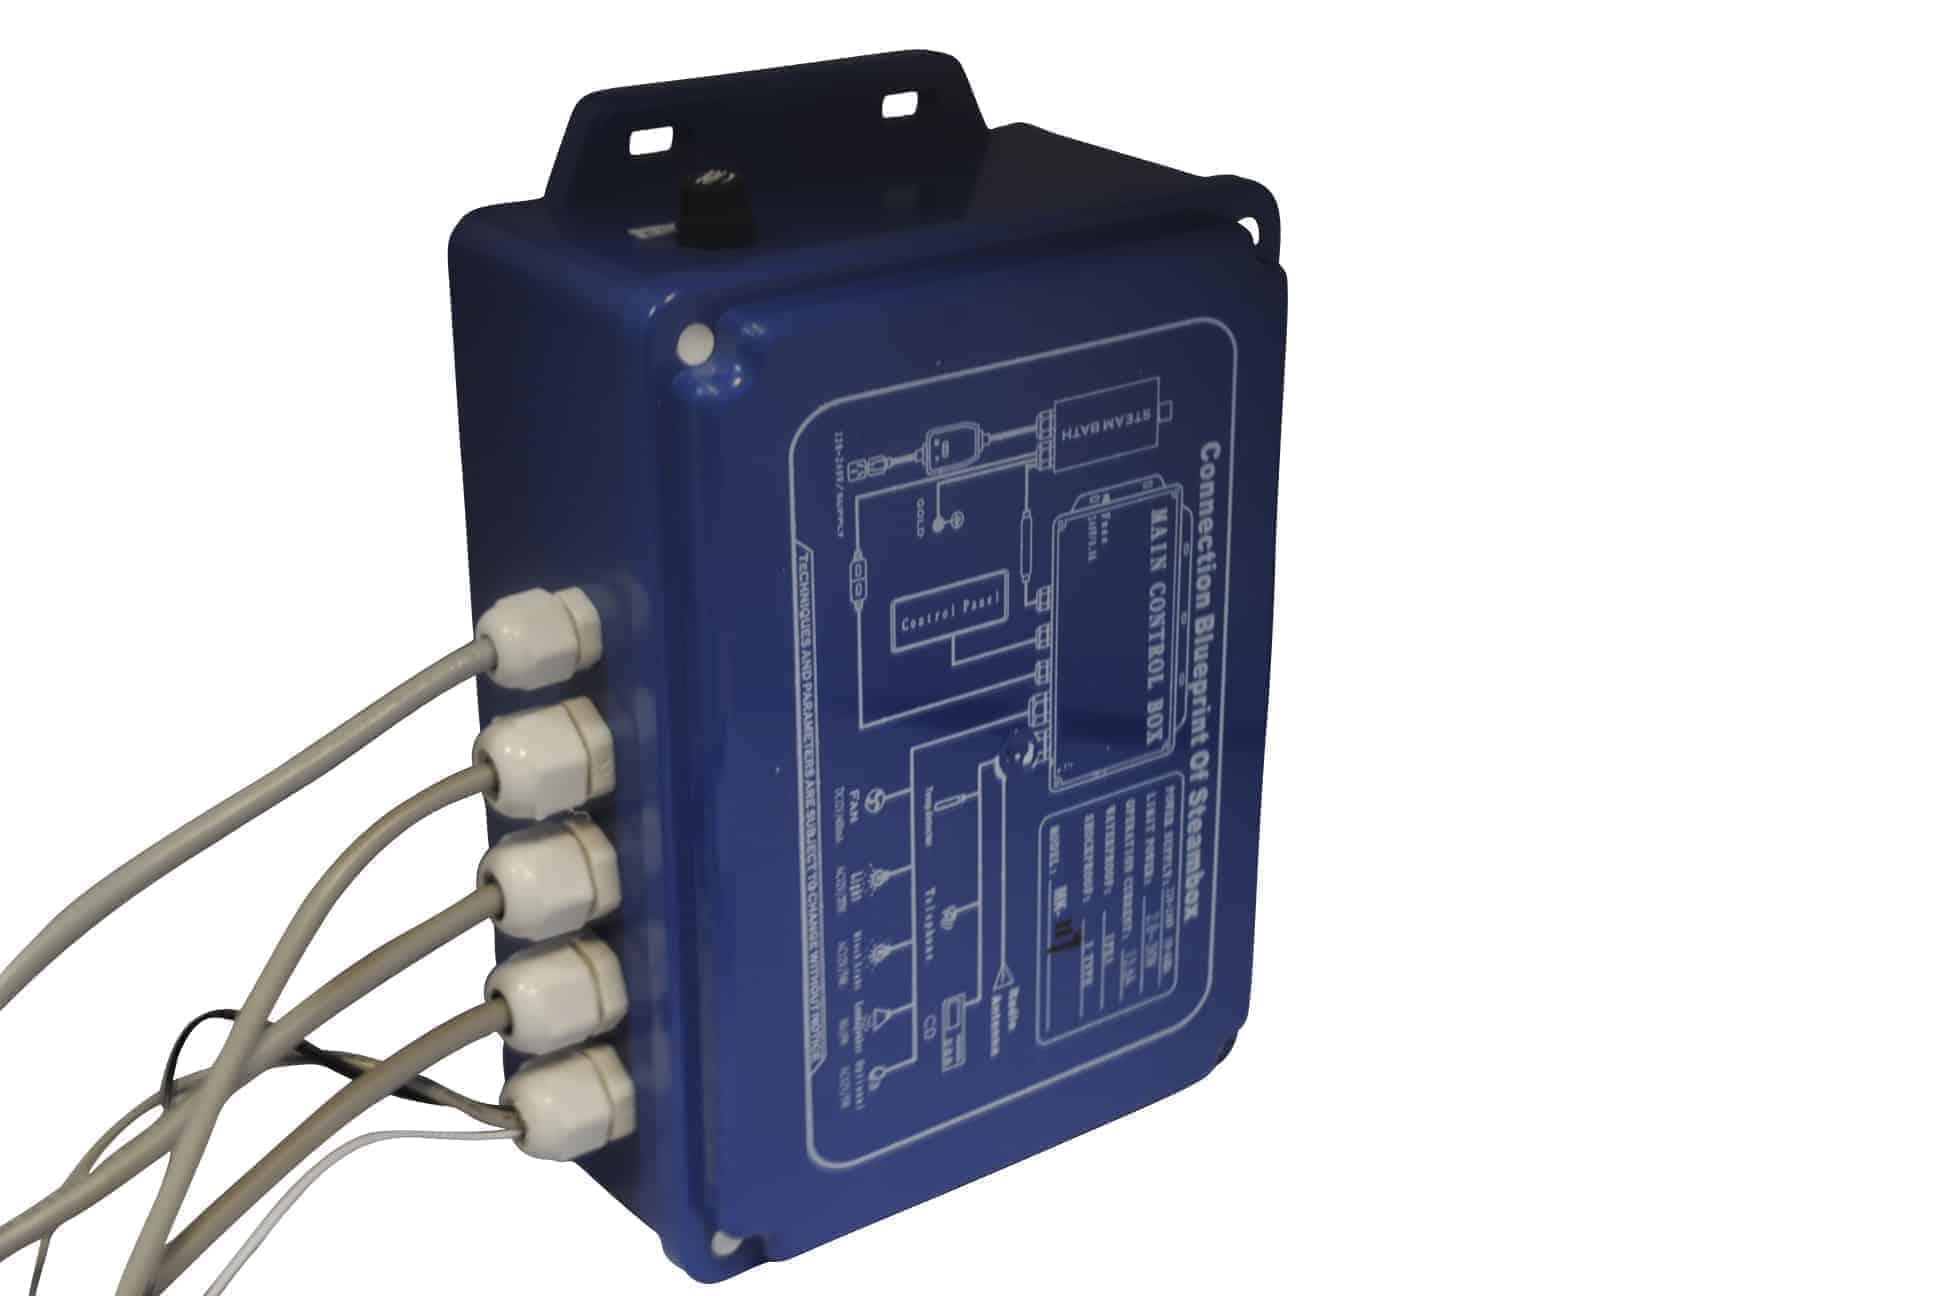 MK 117 Slimline Electronics